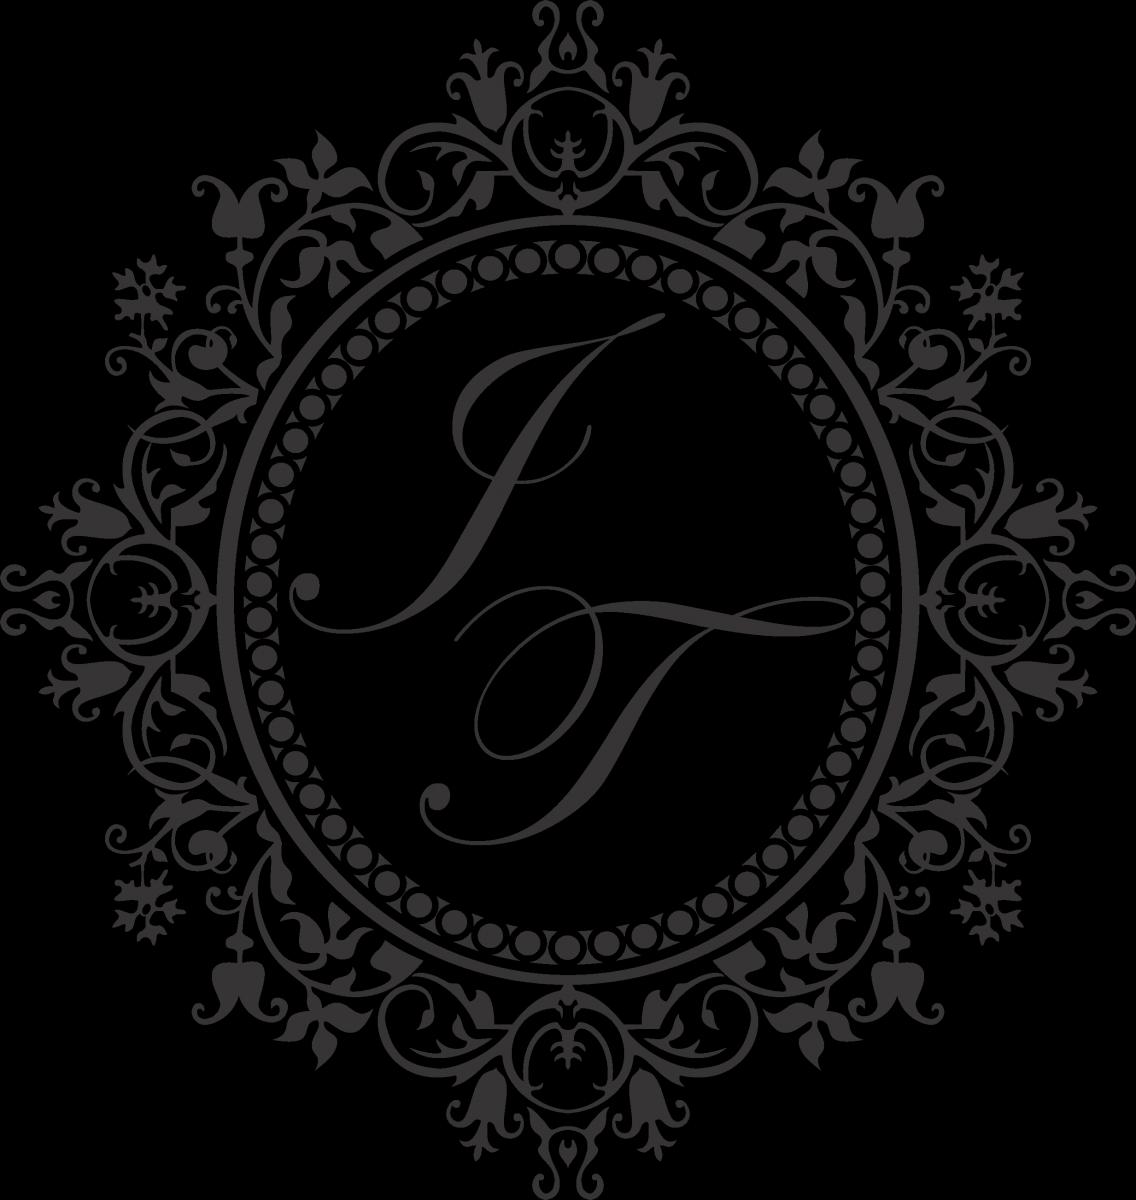 layout de convite de casamento gratis pesquisa google diversos